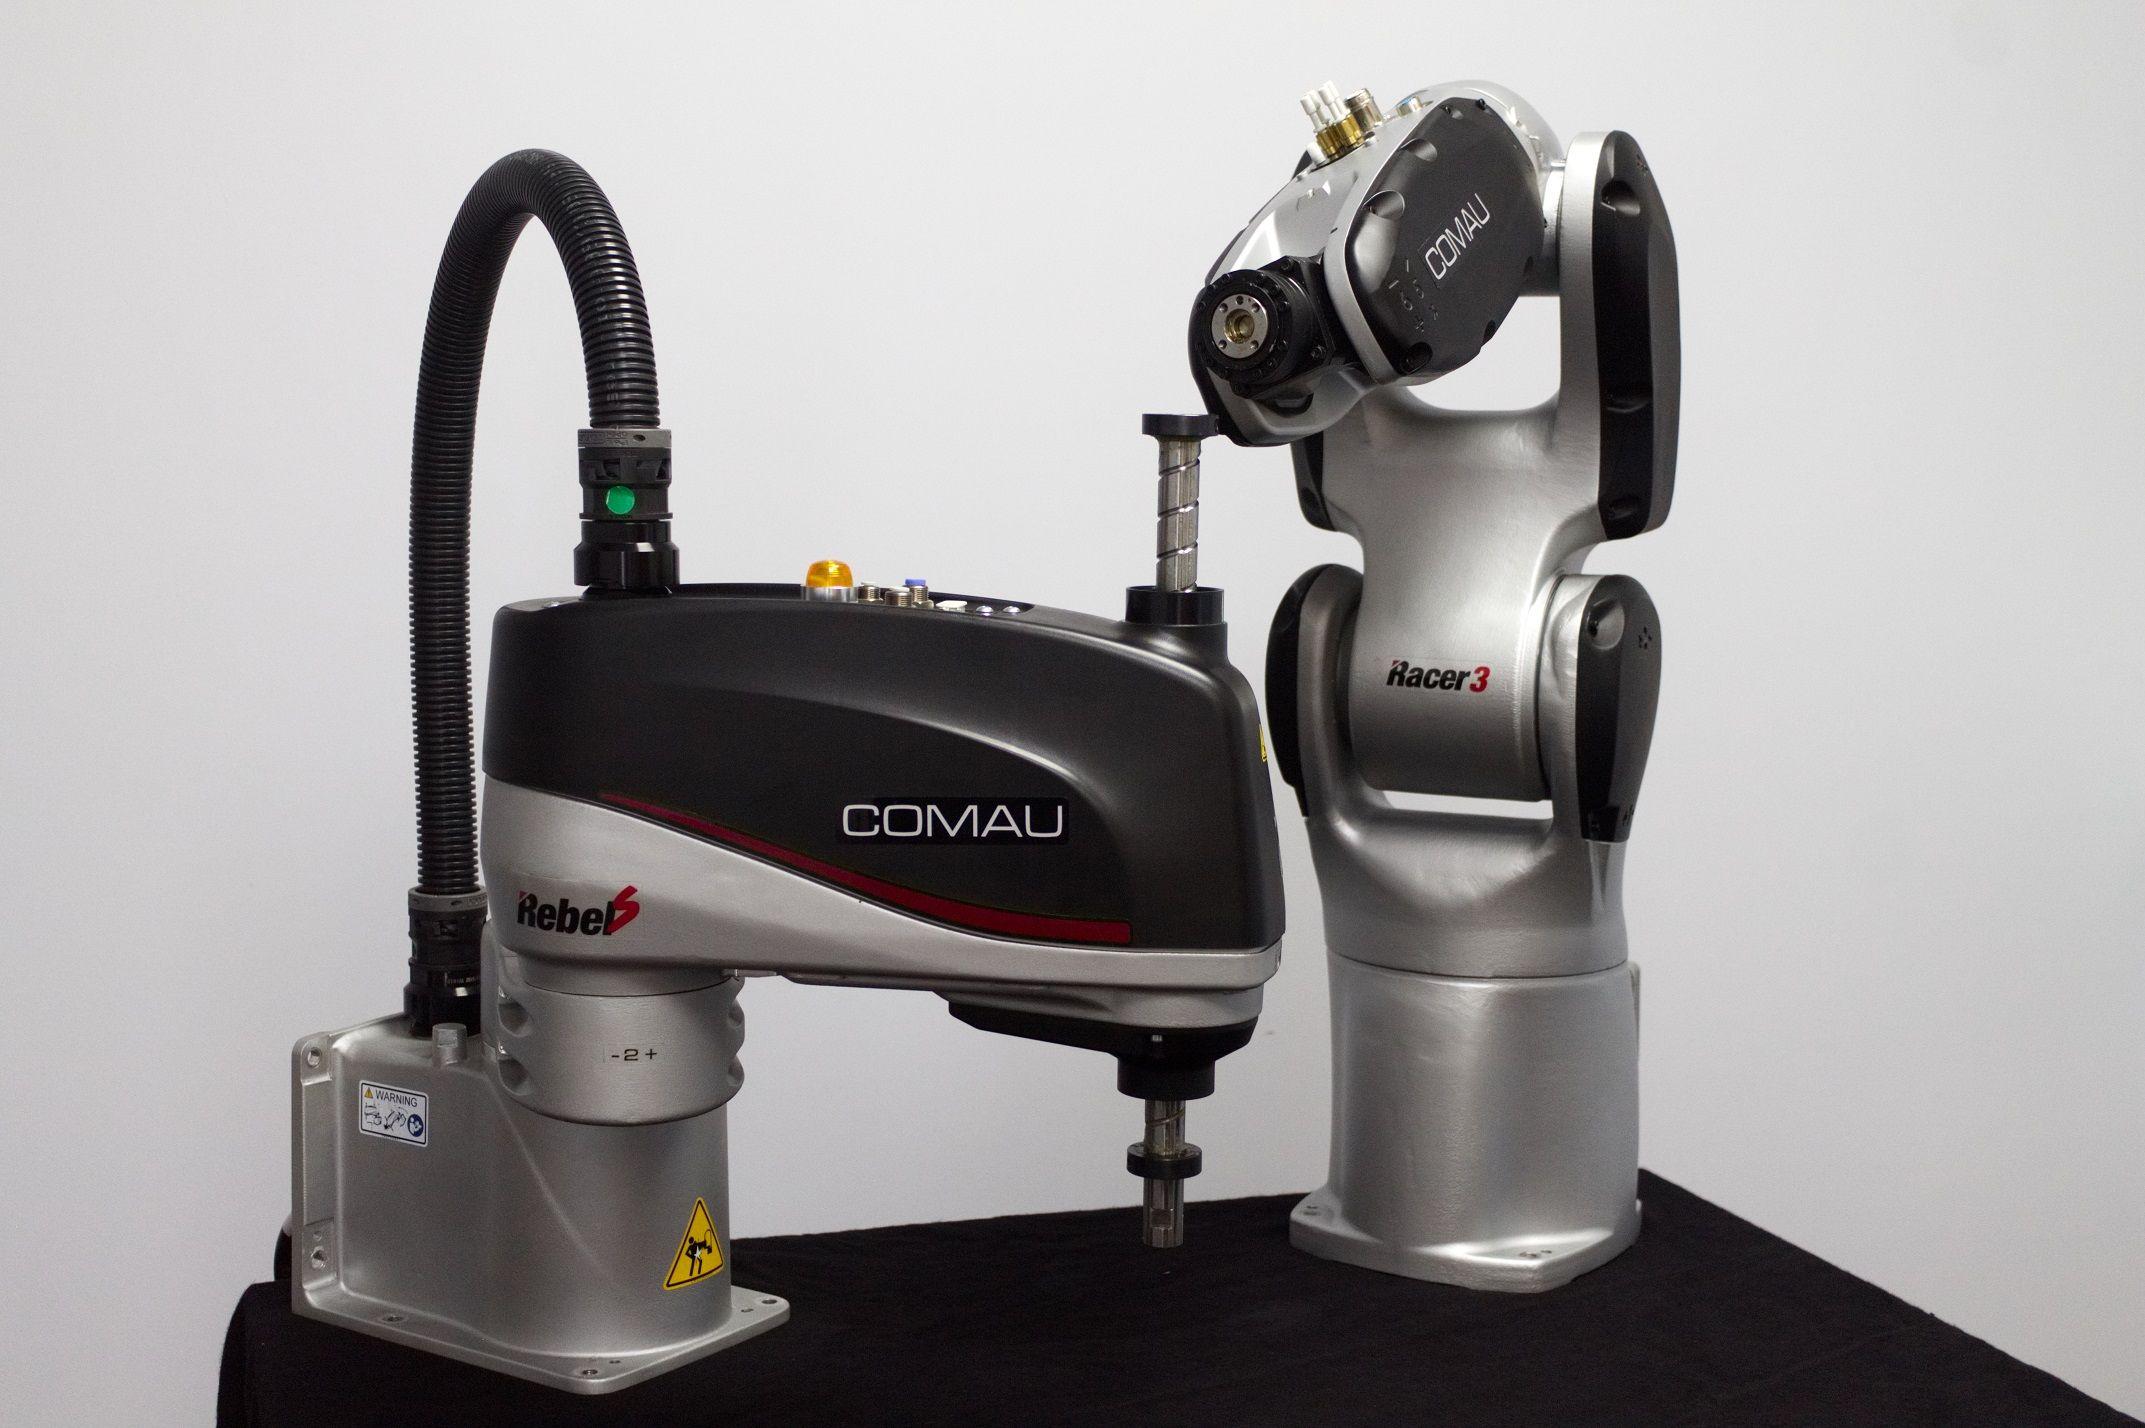 Robotics & Motion Control Adbro